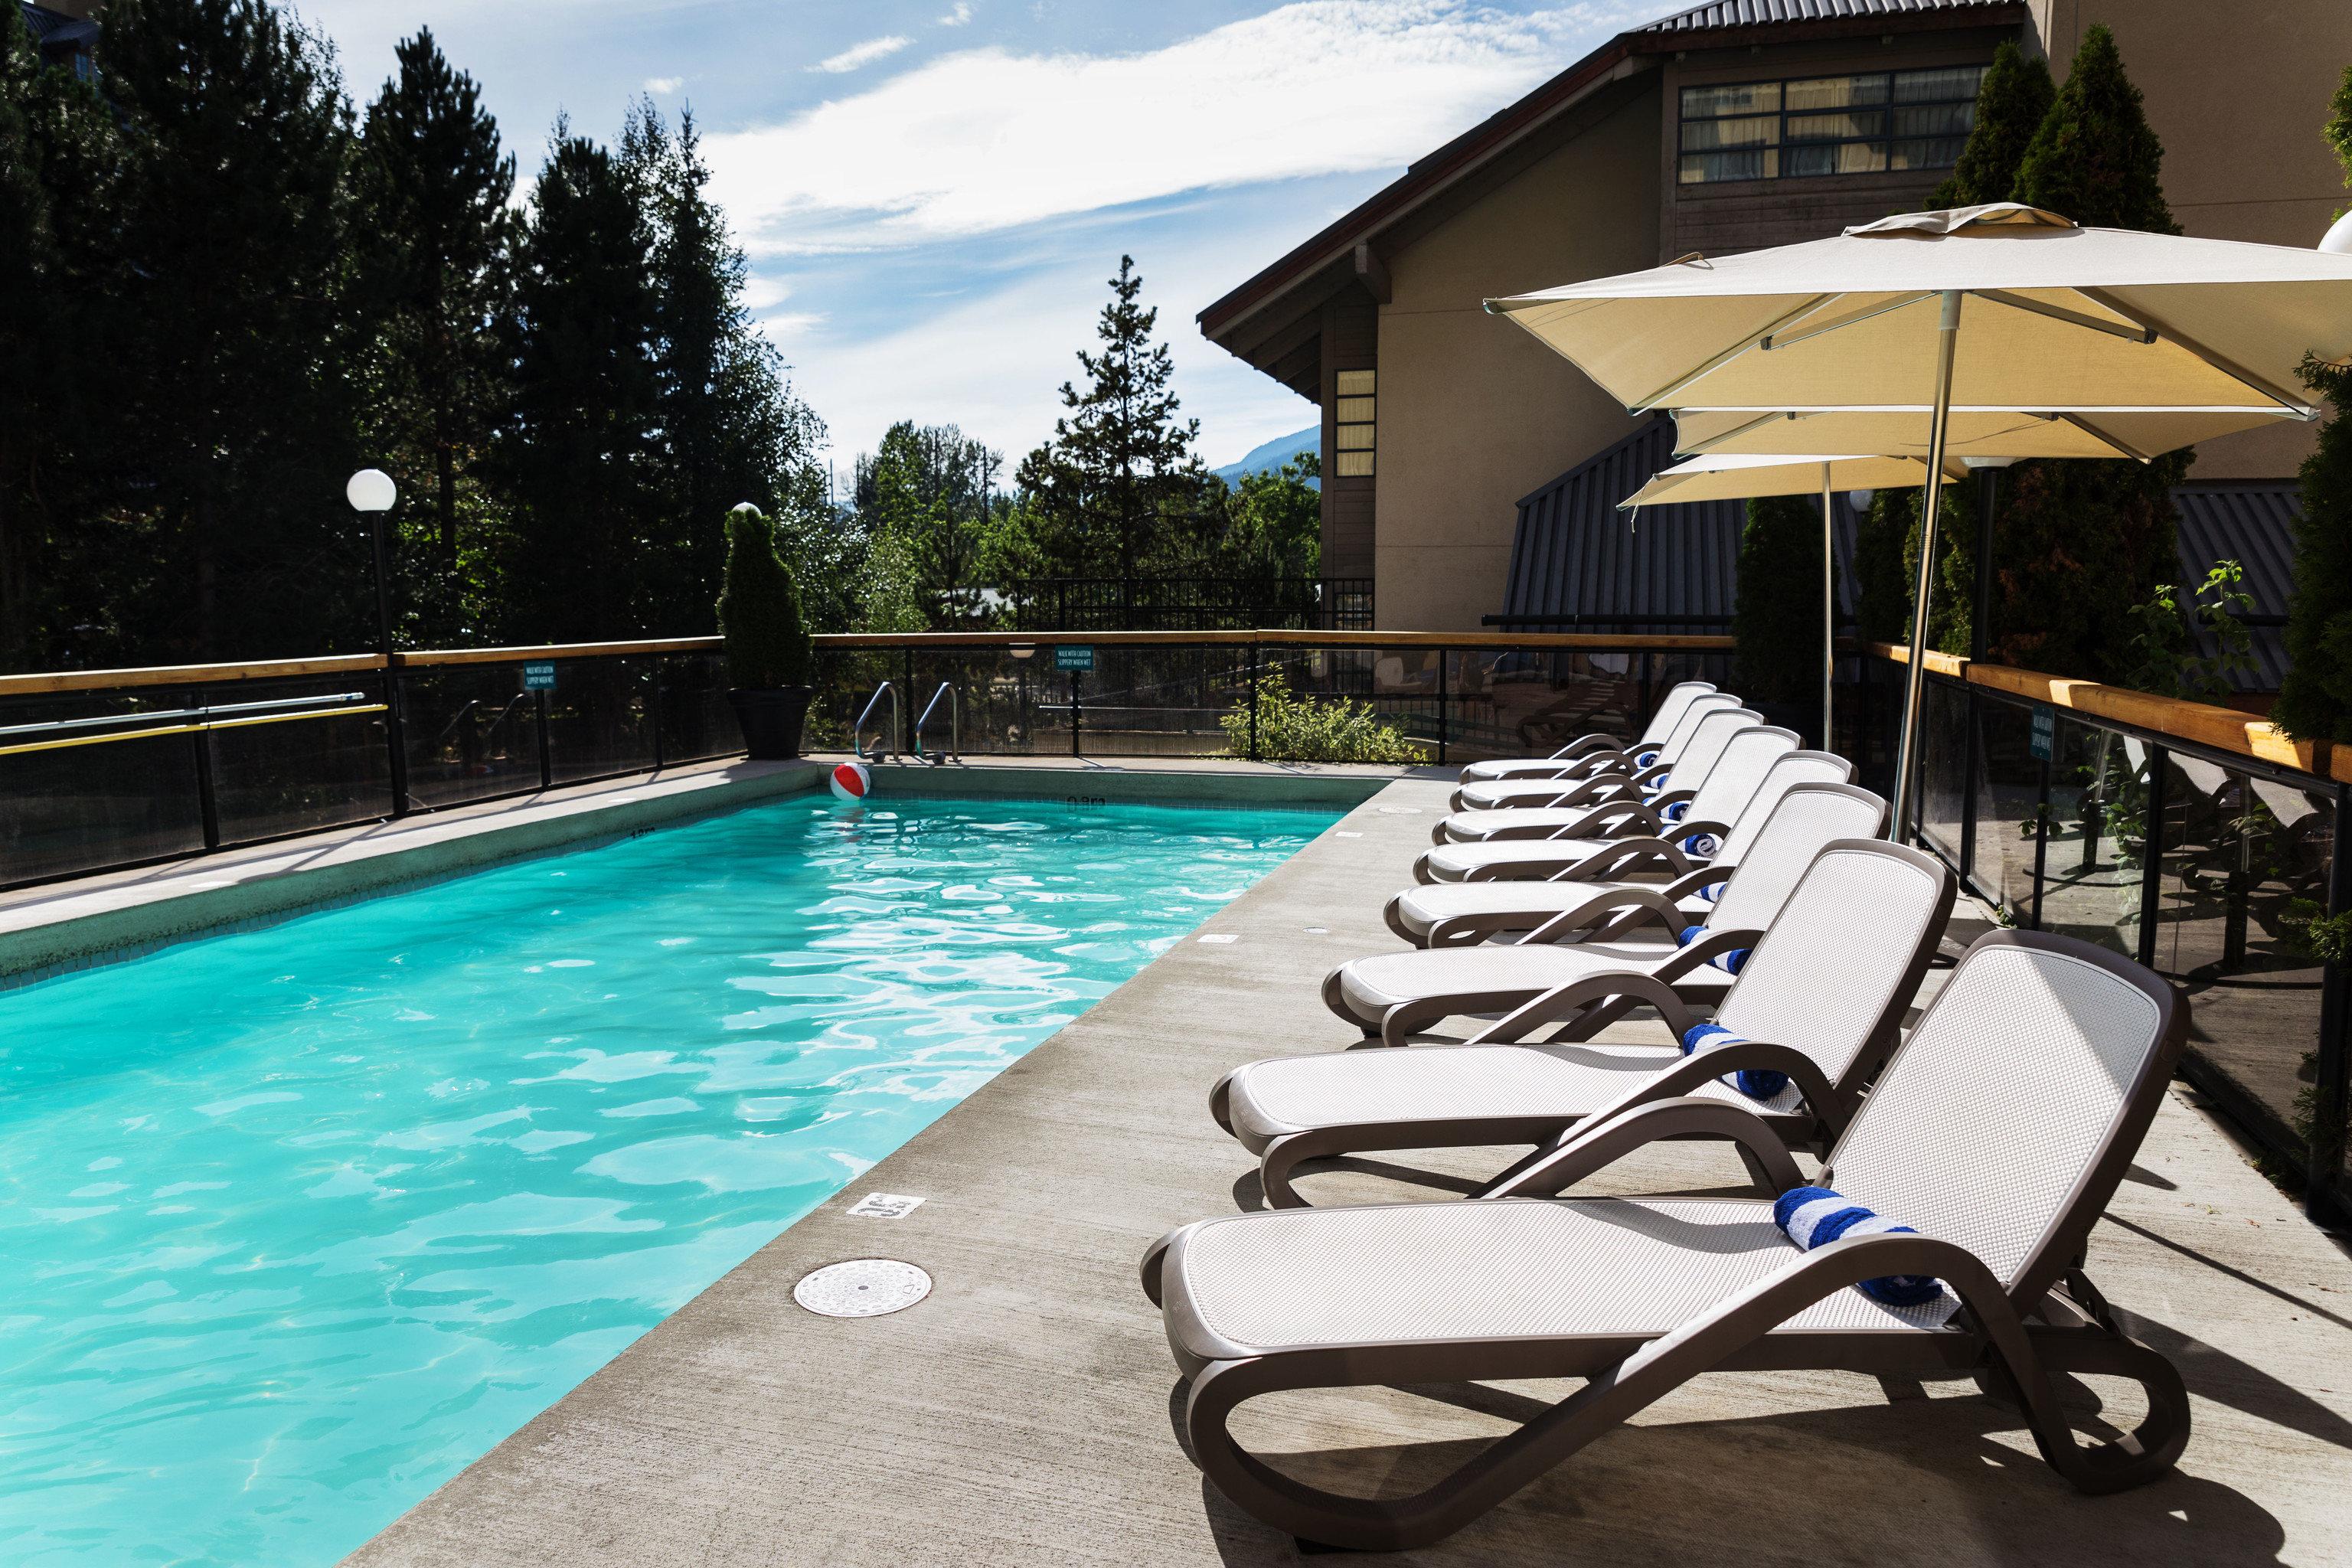 tree Pool leisure swimming pool chair property Resort Villa backyard swimming Deck day